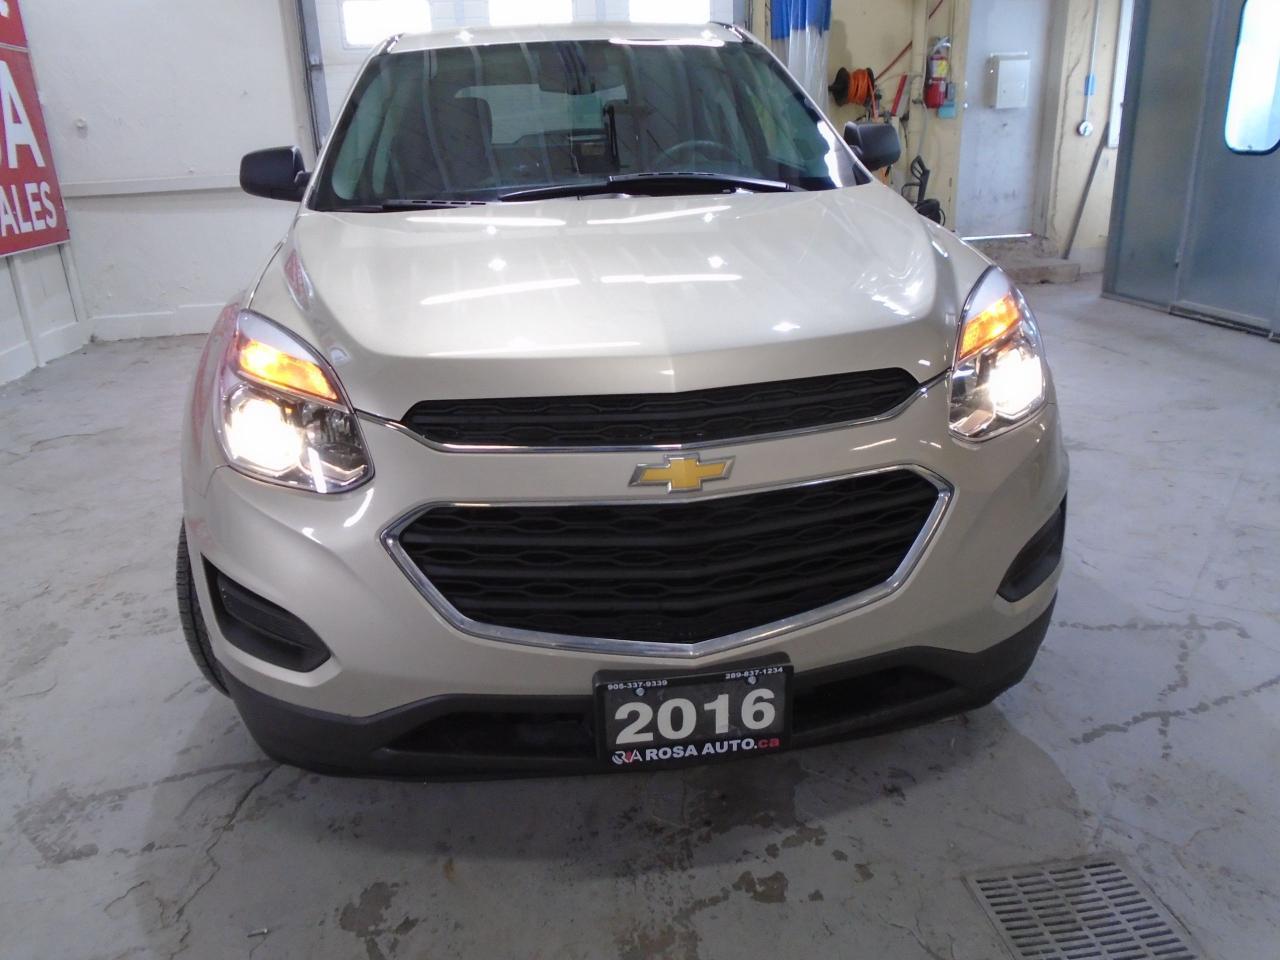 2016 Chevrolet Equinox